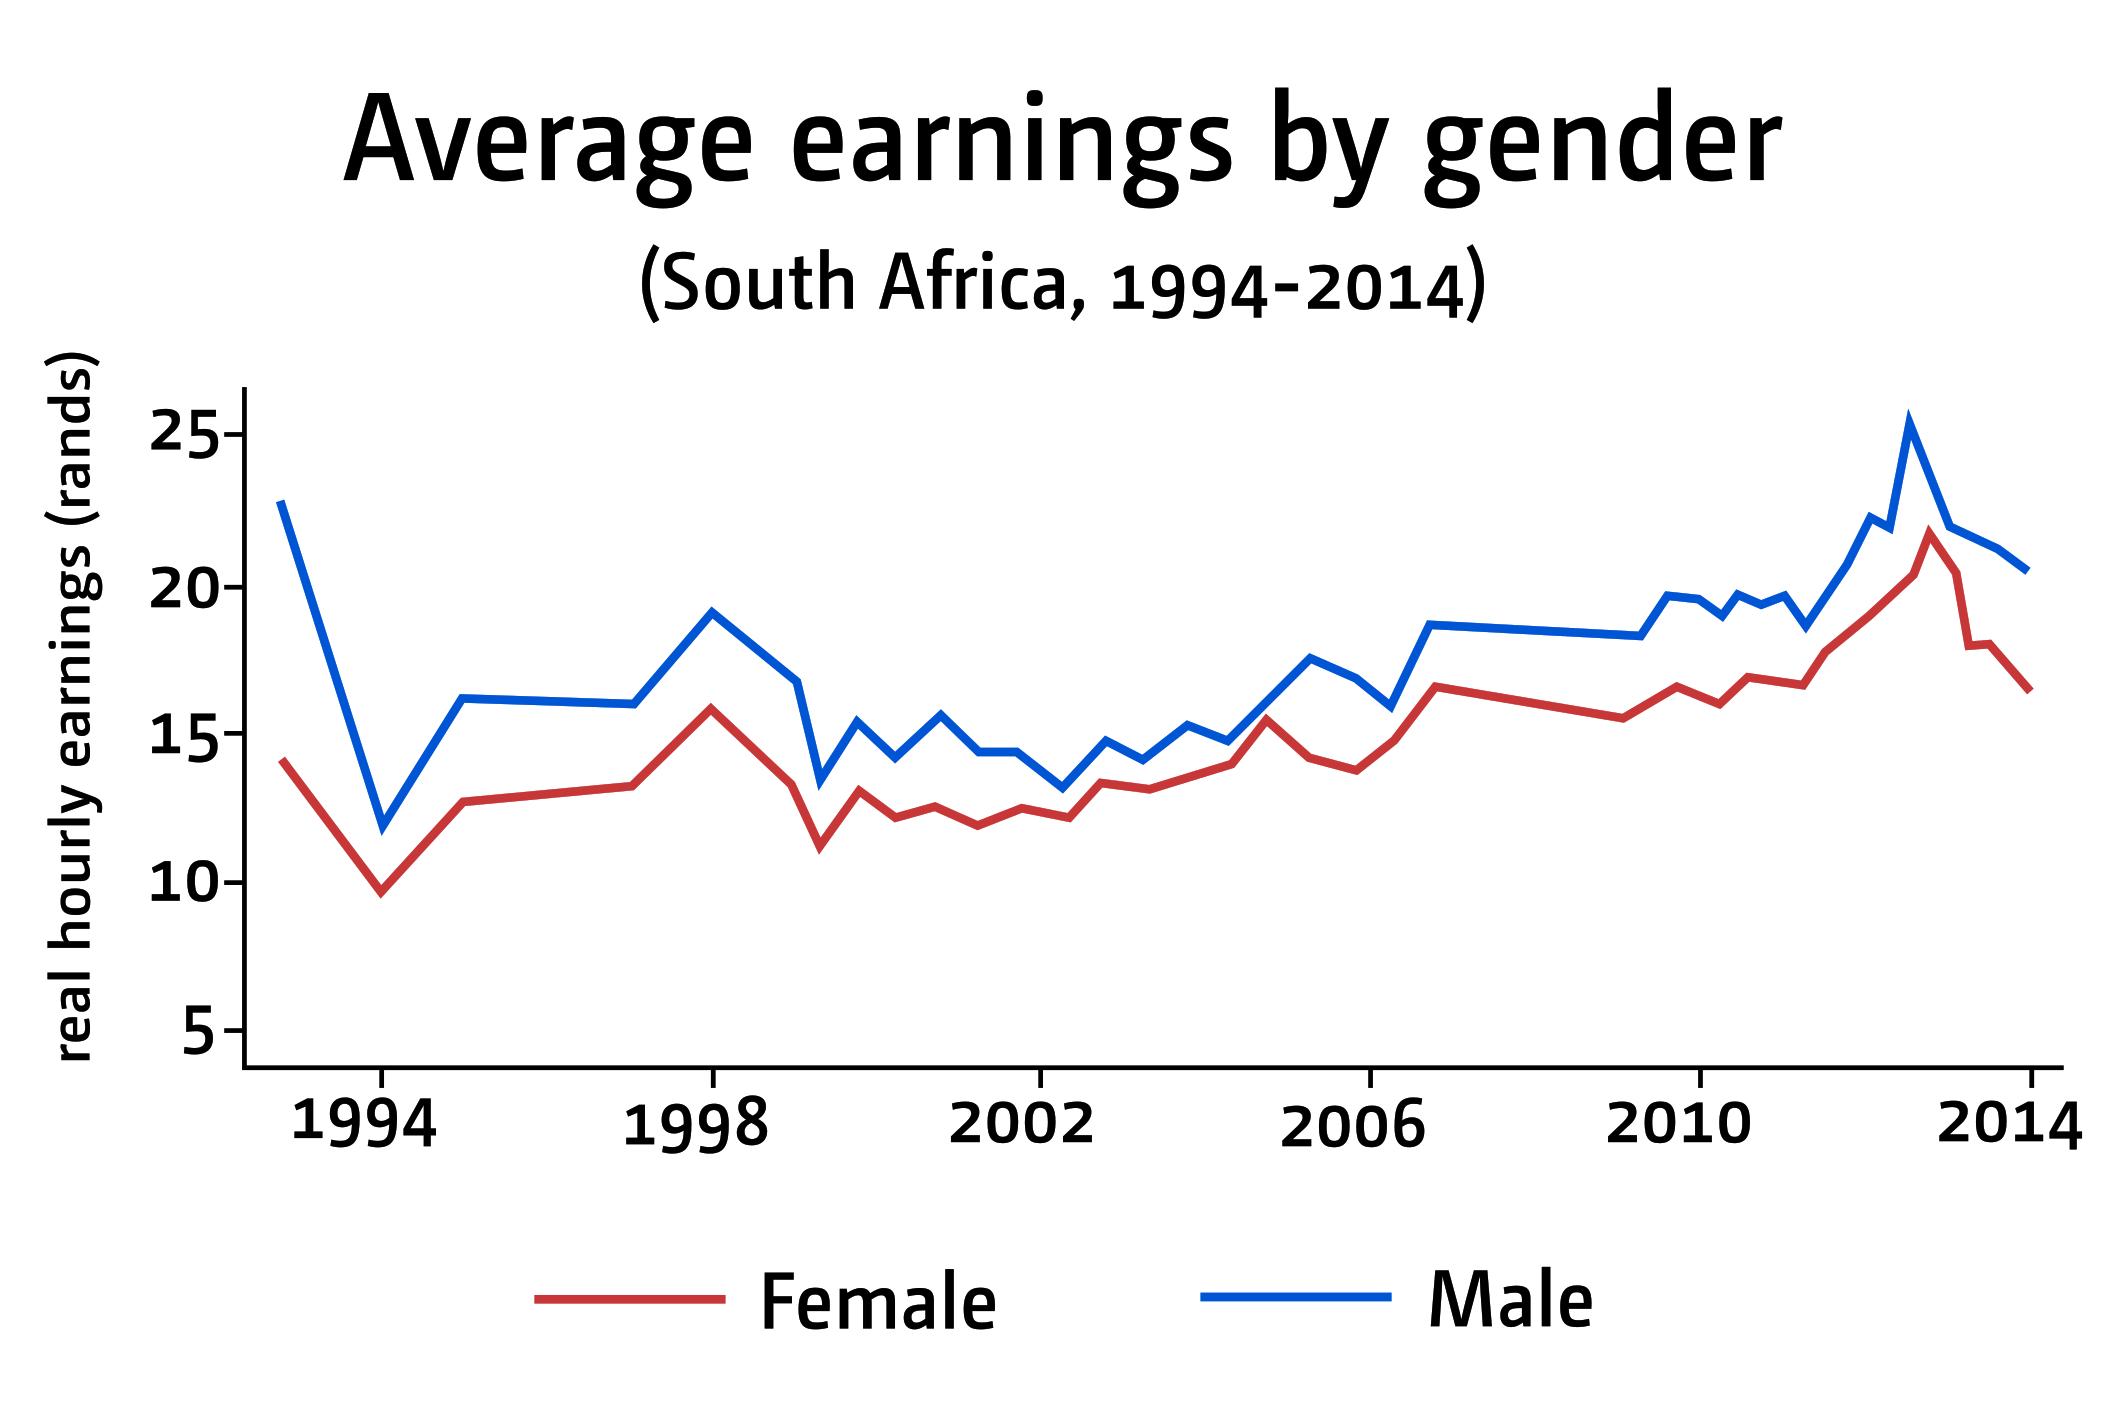 Figure 1: average earnings by gender